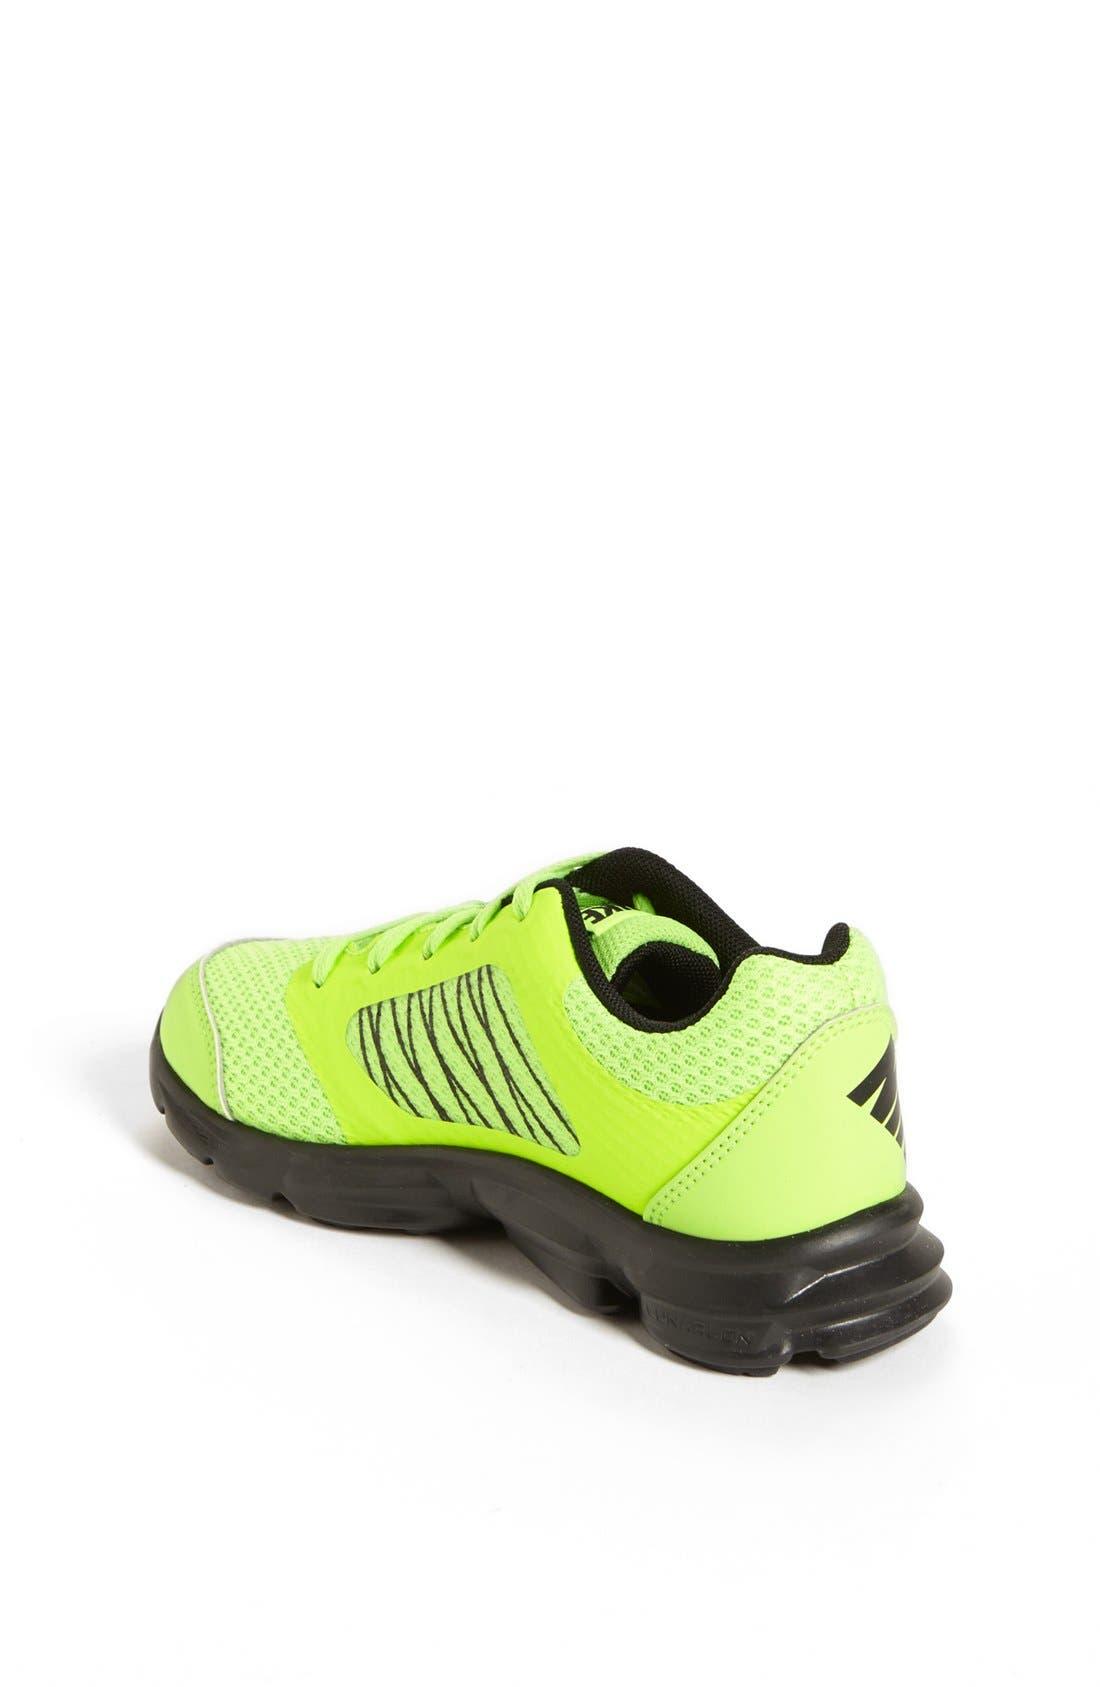 Alternate Image 2  - Nike 'Lunarsprint' Running Shoe (Toddler & Little Kid)